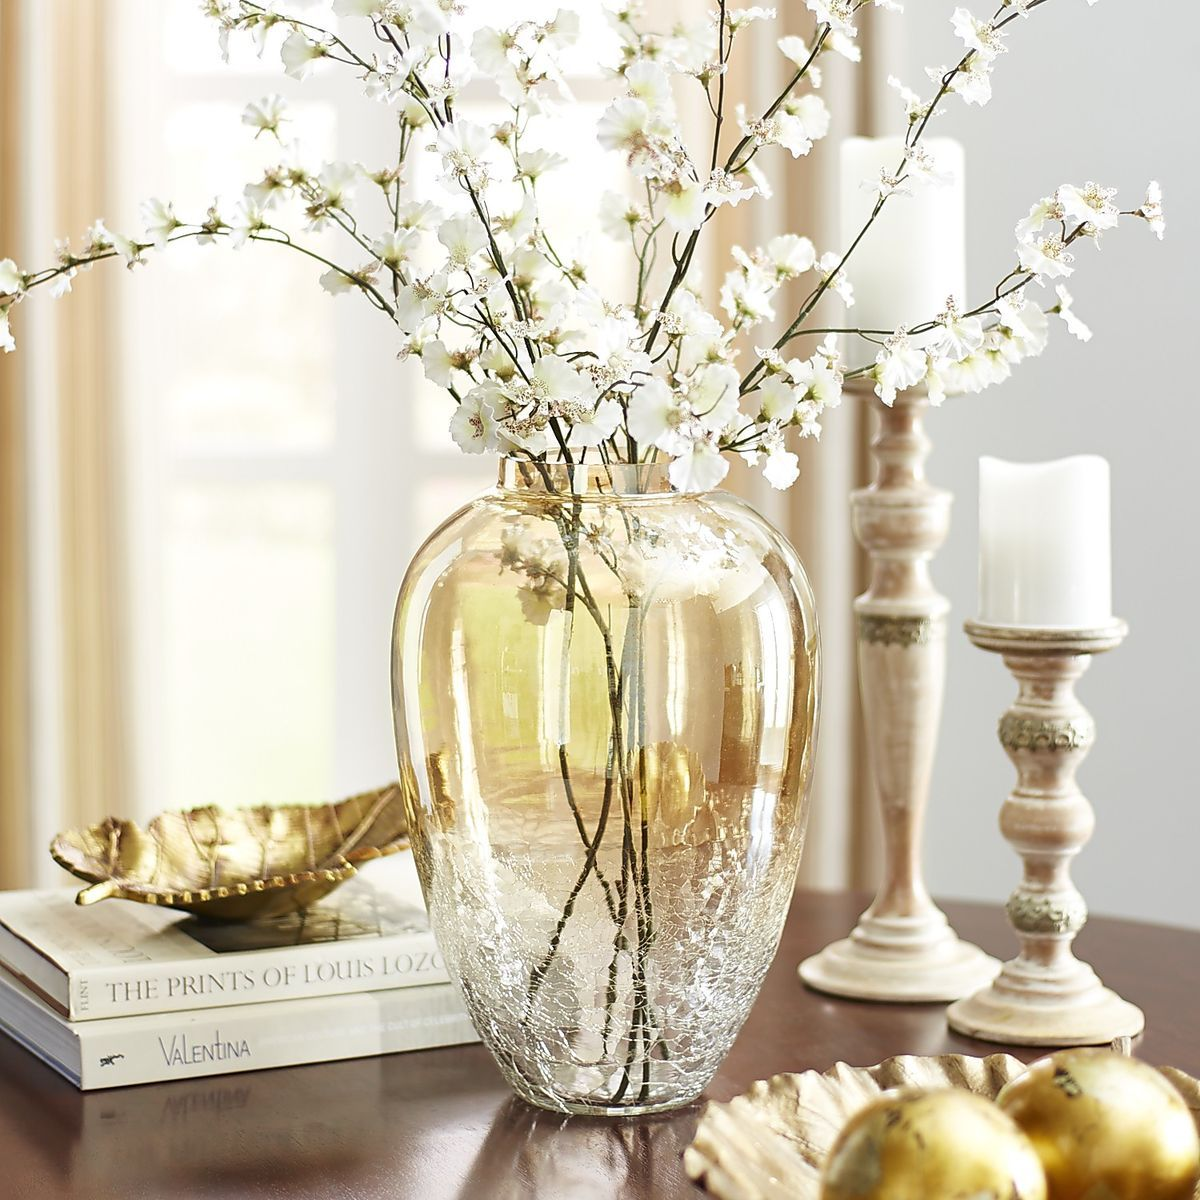 Gold luster crackle glass vases pier 1 imports living room gold luster crackle glass vases pier 1 imports reviewsmspy